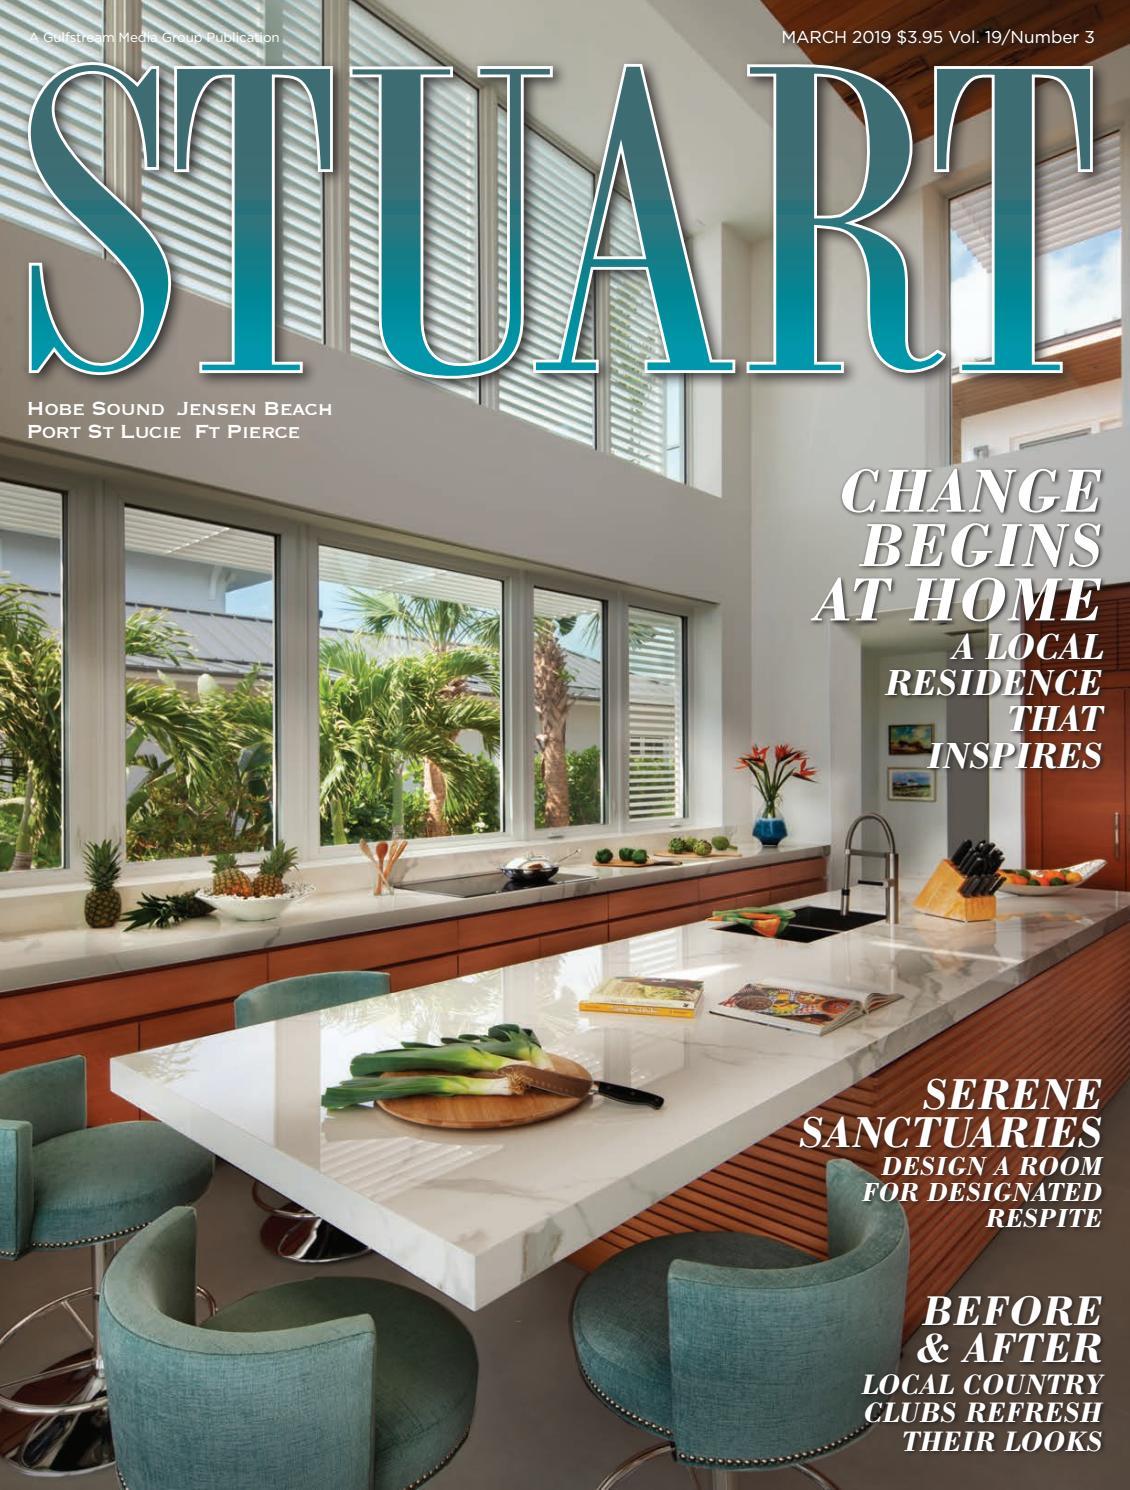 foto de Stuart Magazine March 2019 by Palm Beach Media Group - issuu